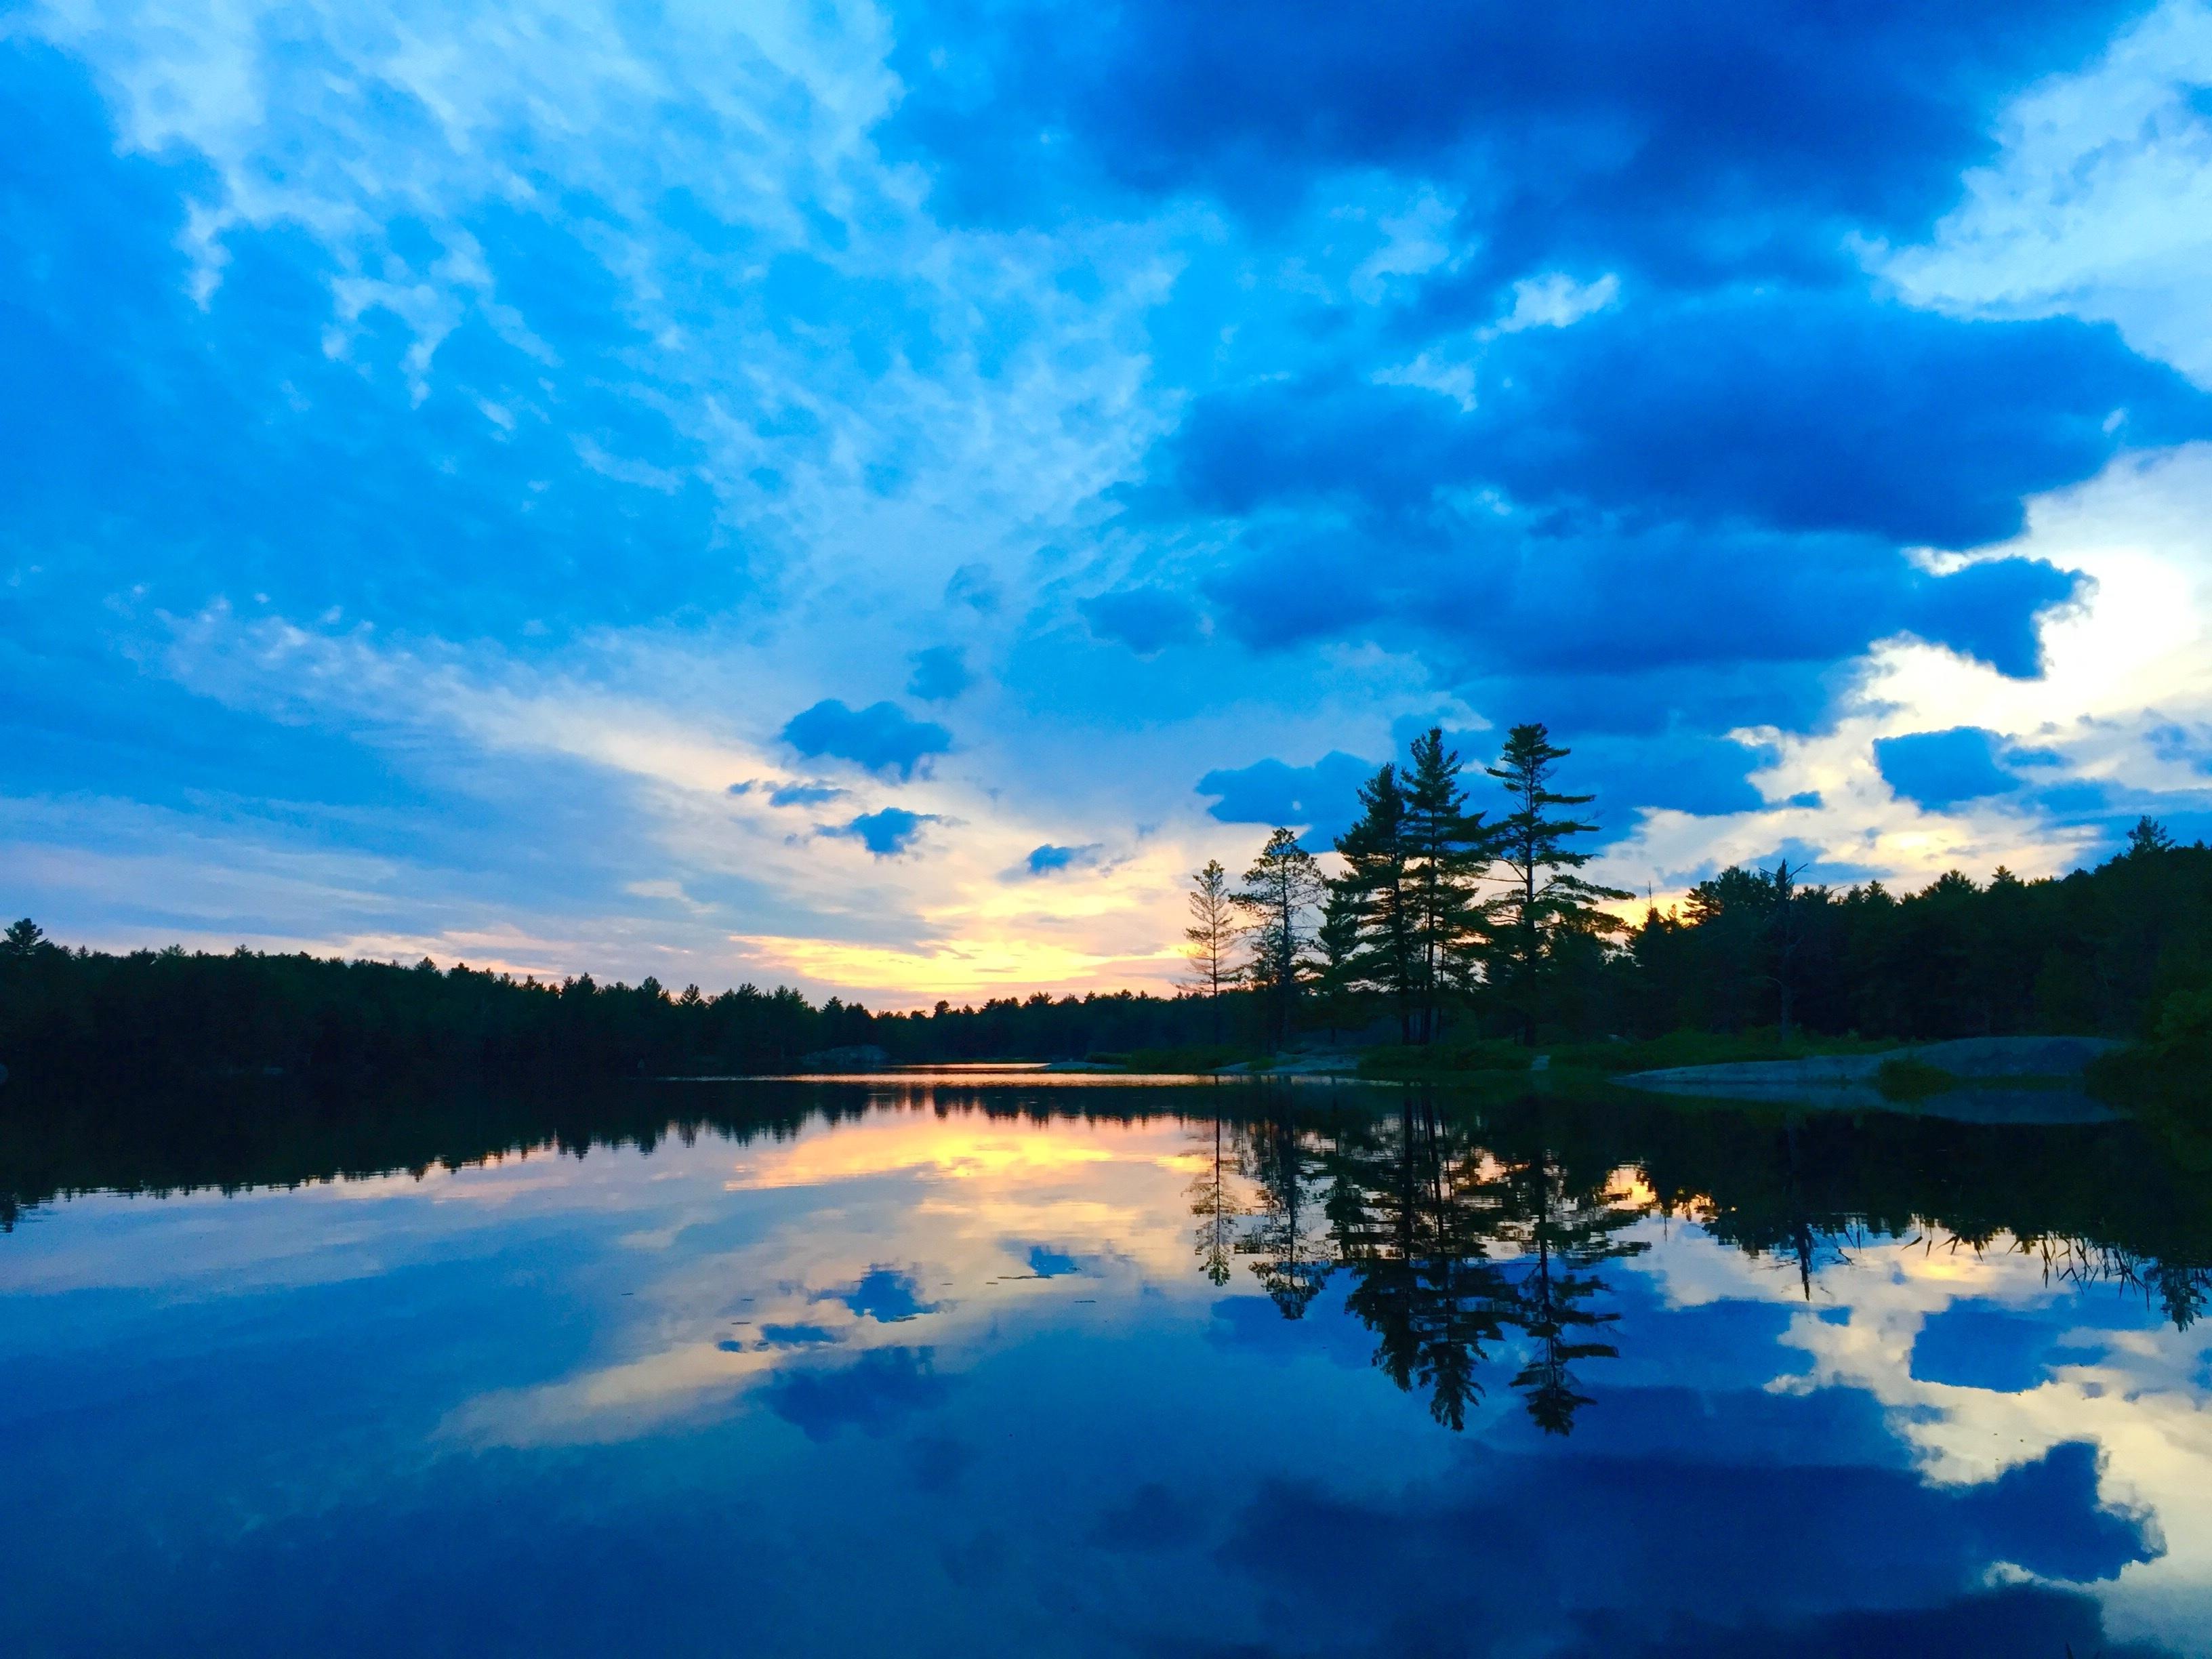 Free Images Water Nature Outdoor Horizon Cloud Sky Sunrise